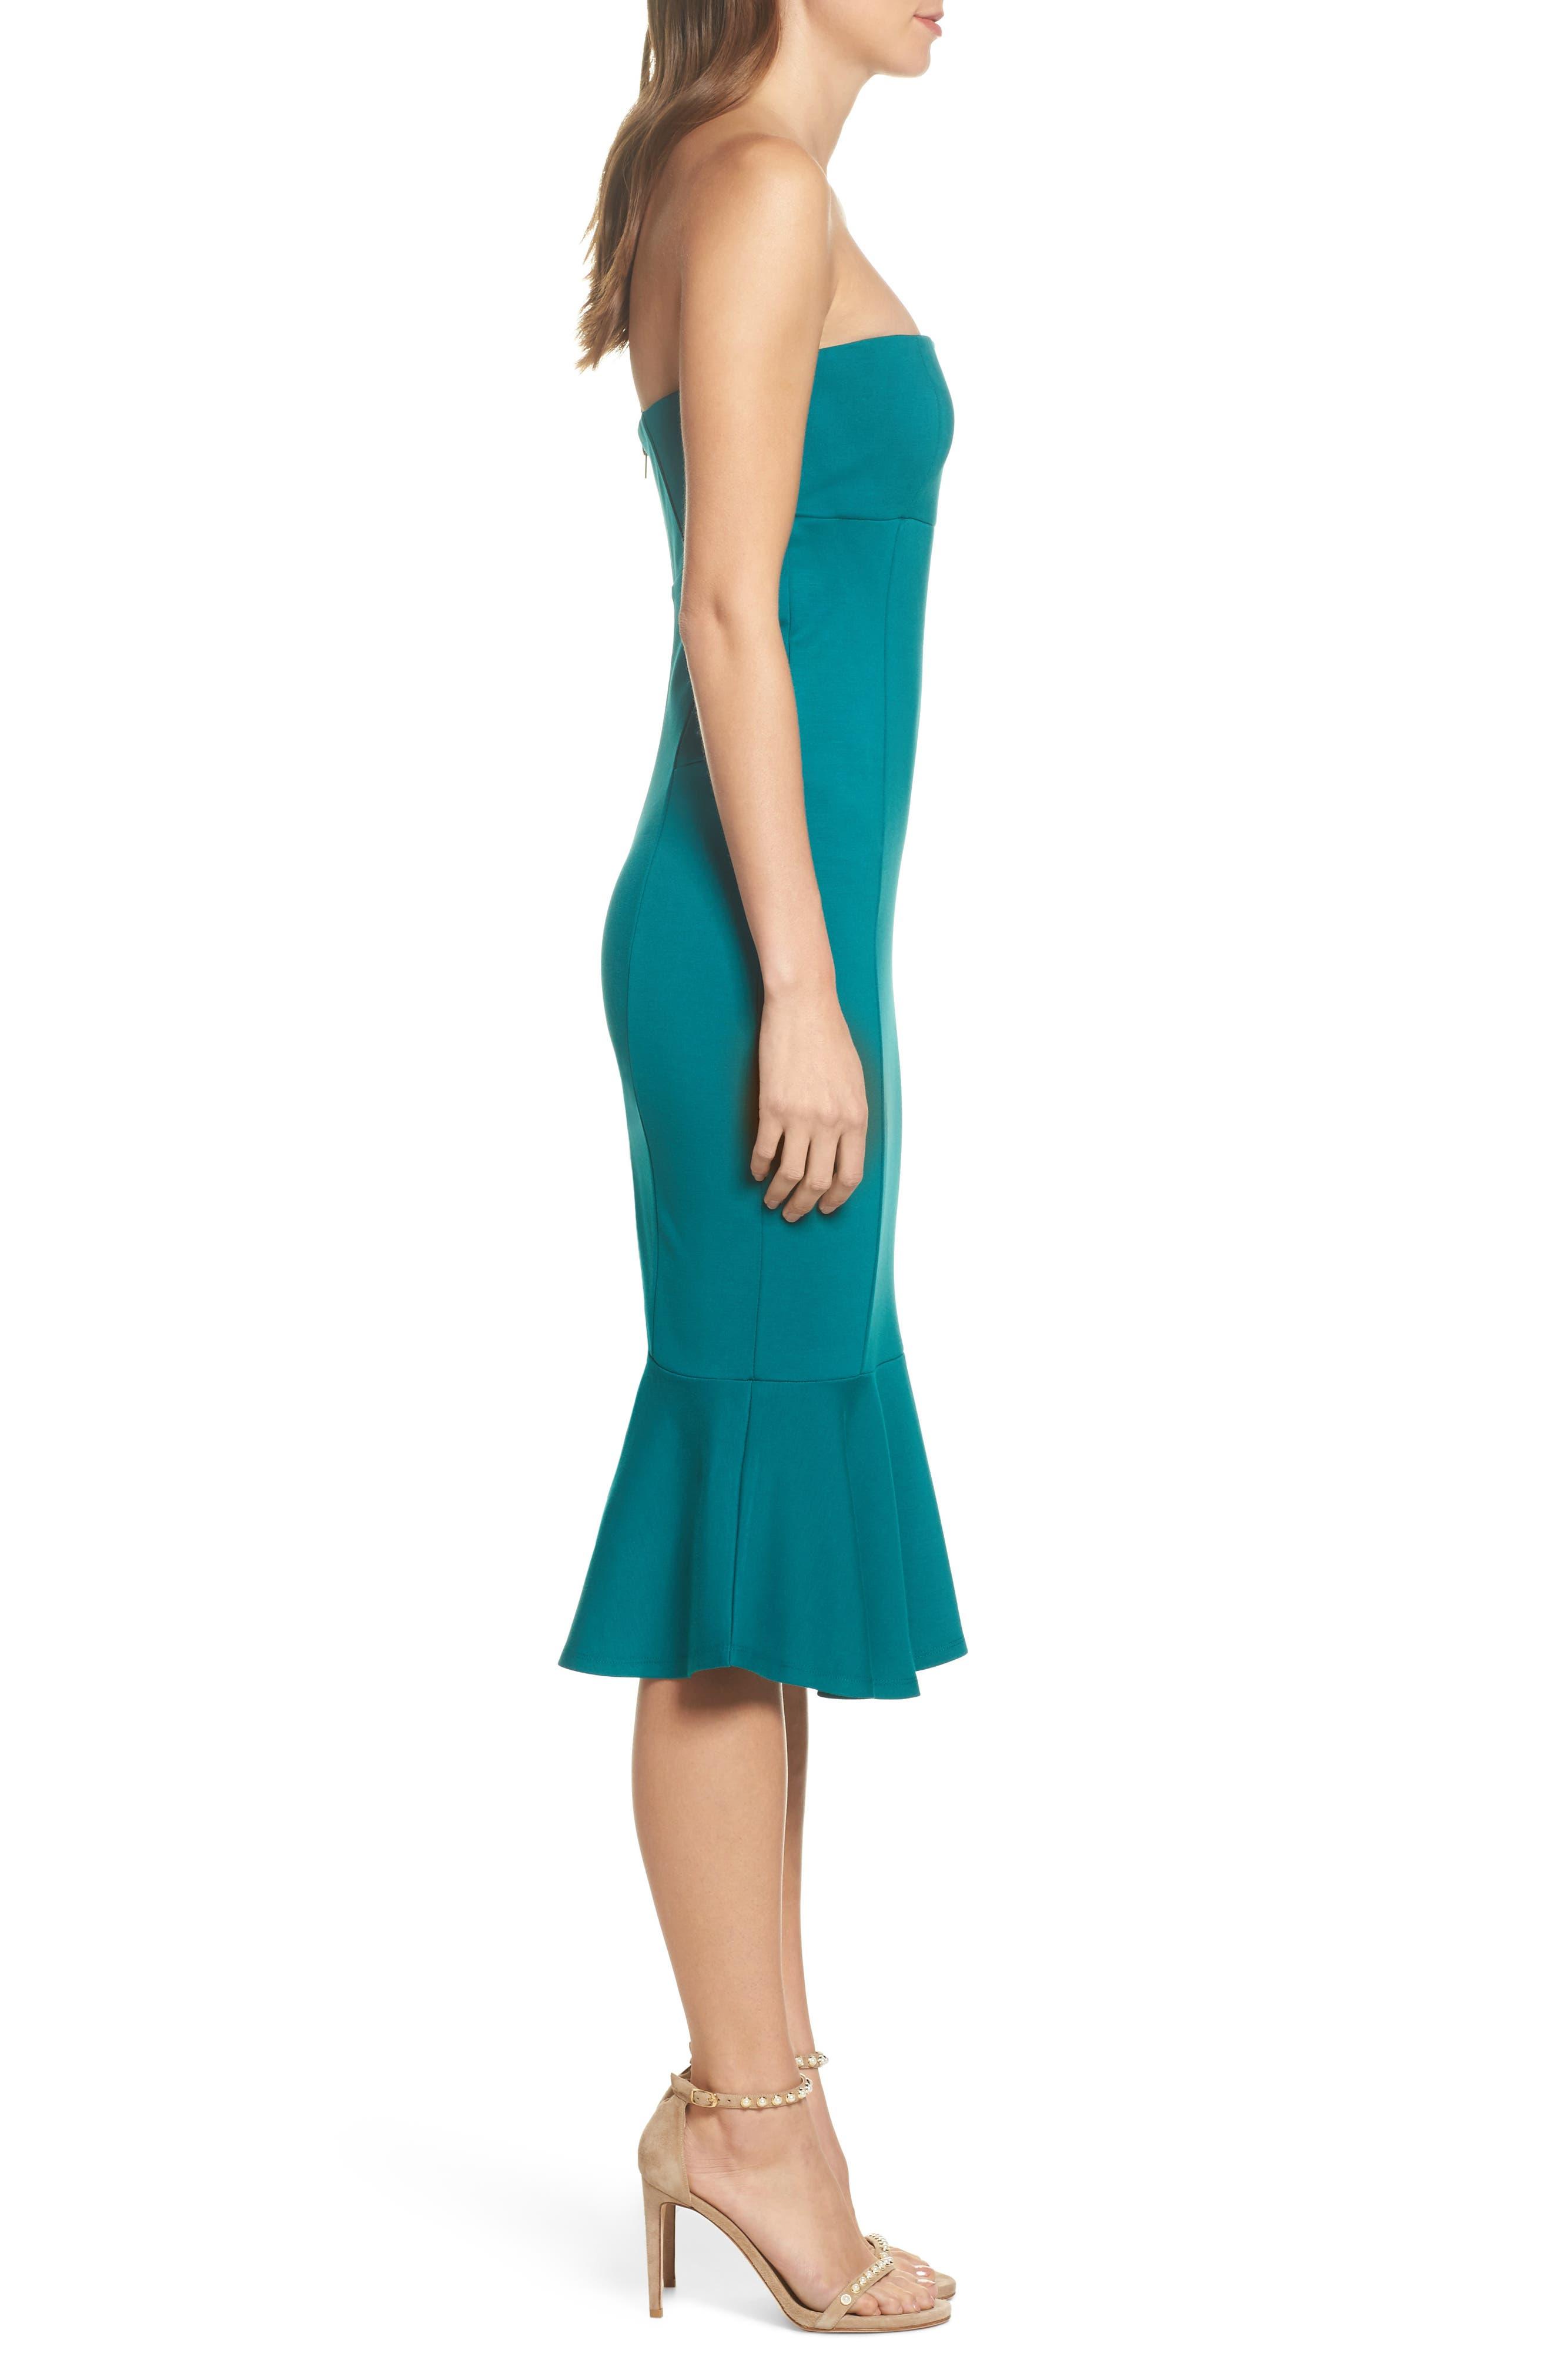 Zabrina Strapless Dress,                             Alternate thumbnail 3, color,                             302